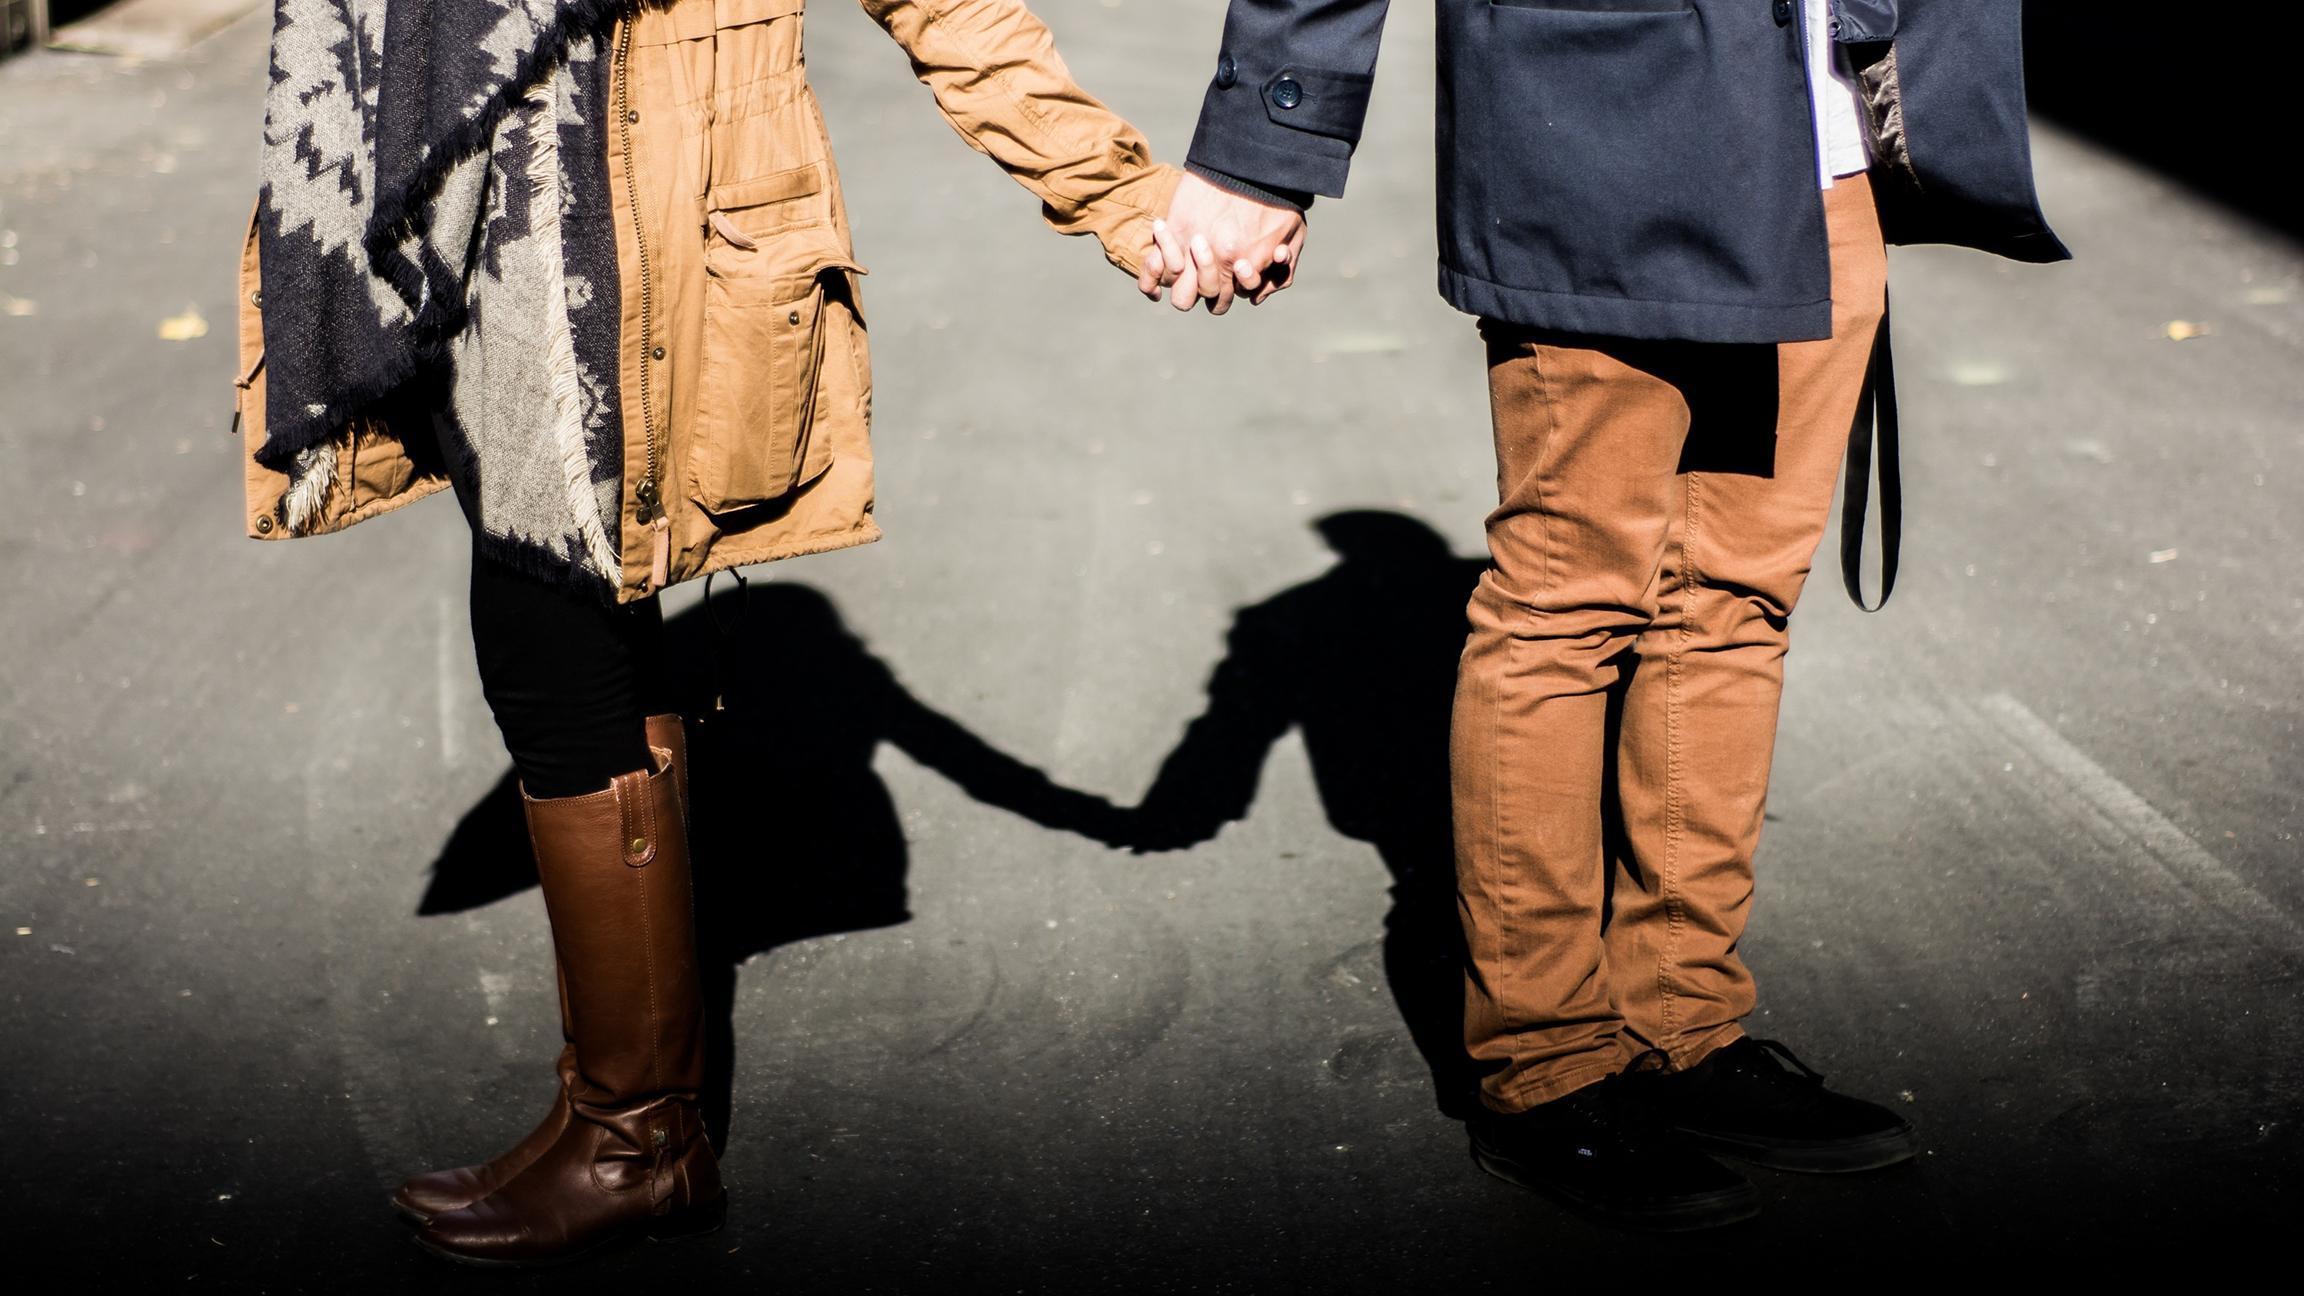 GERALDINE: Strange hookup rituals around the world